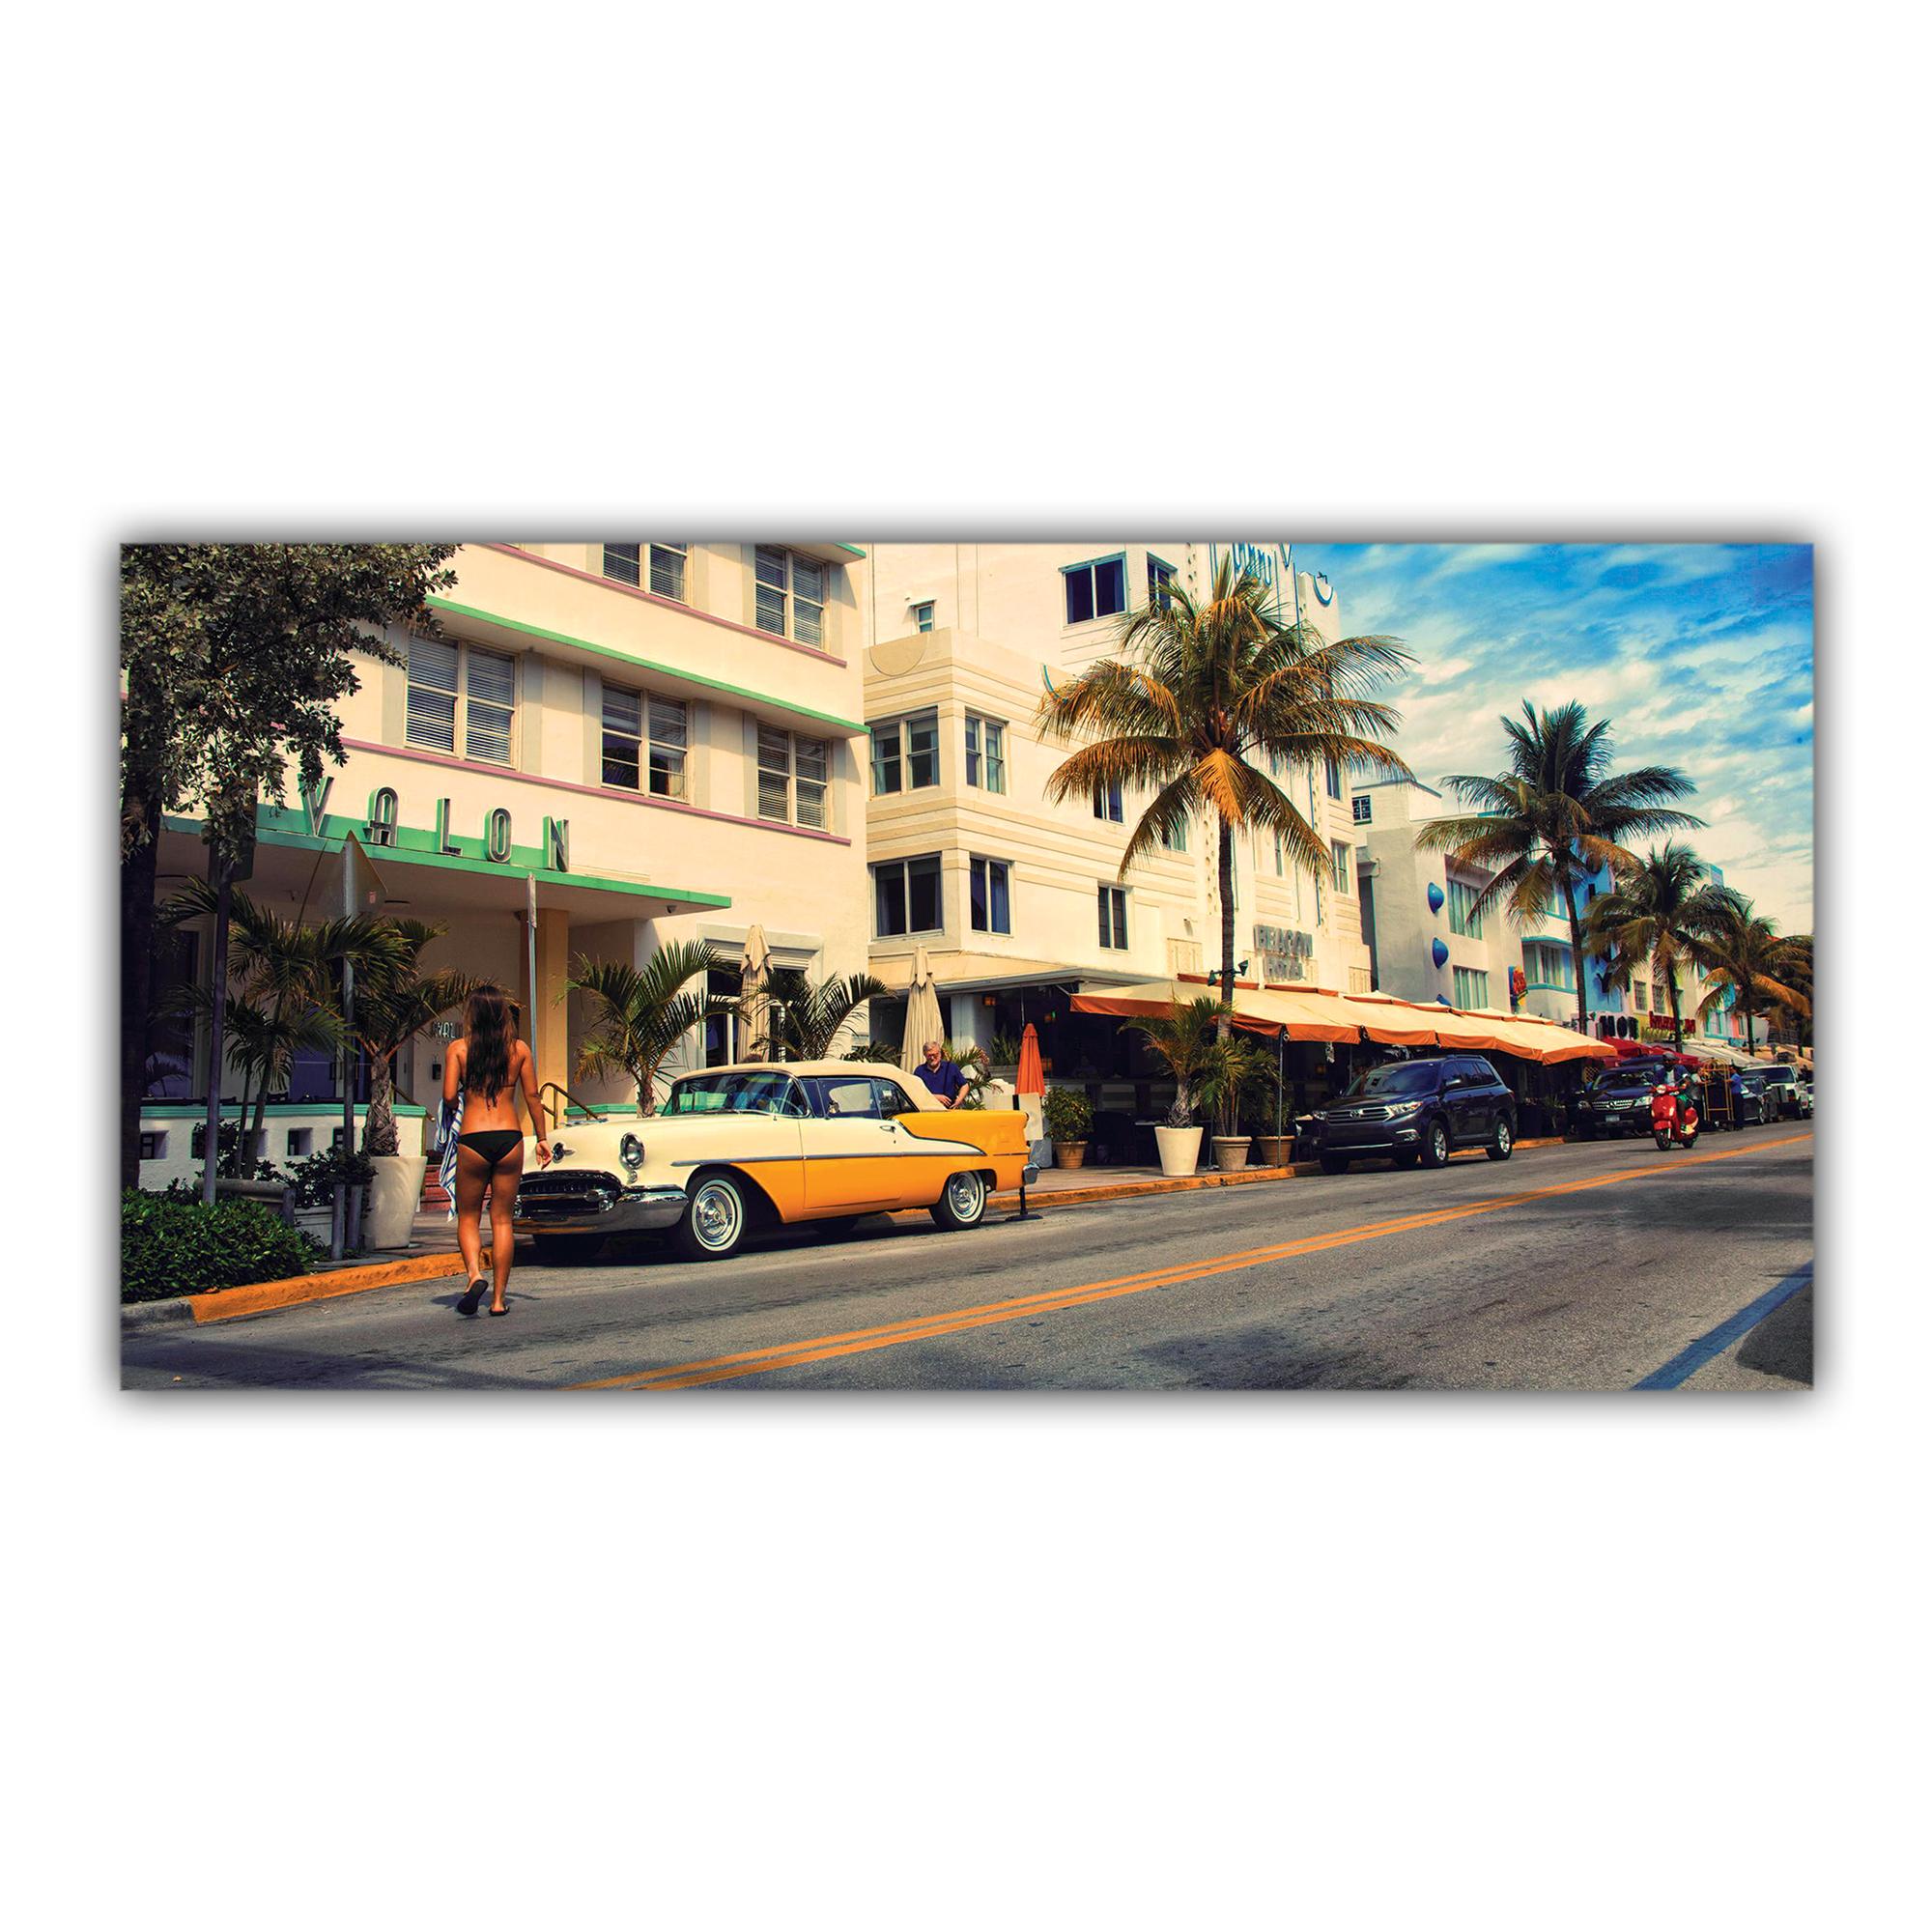 Vice City Miami Floride USA